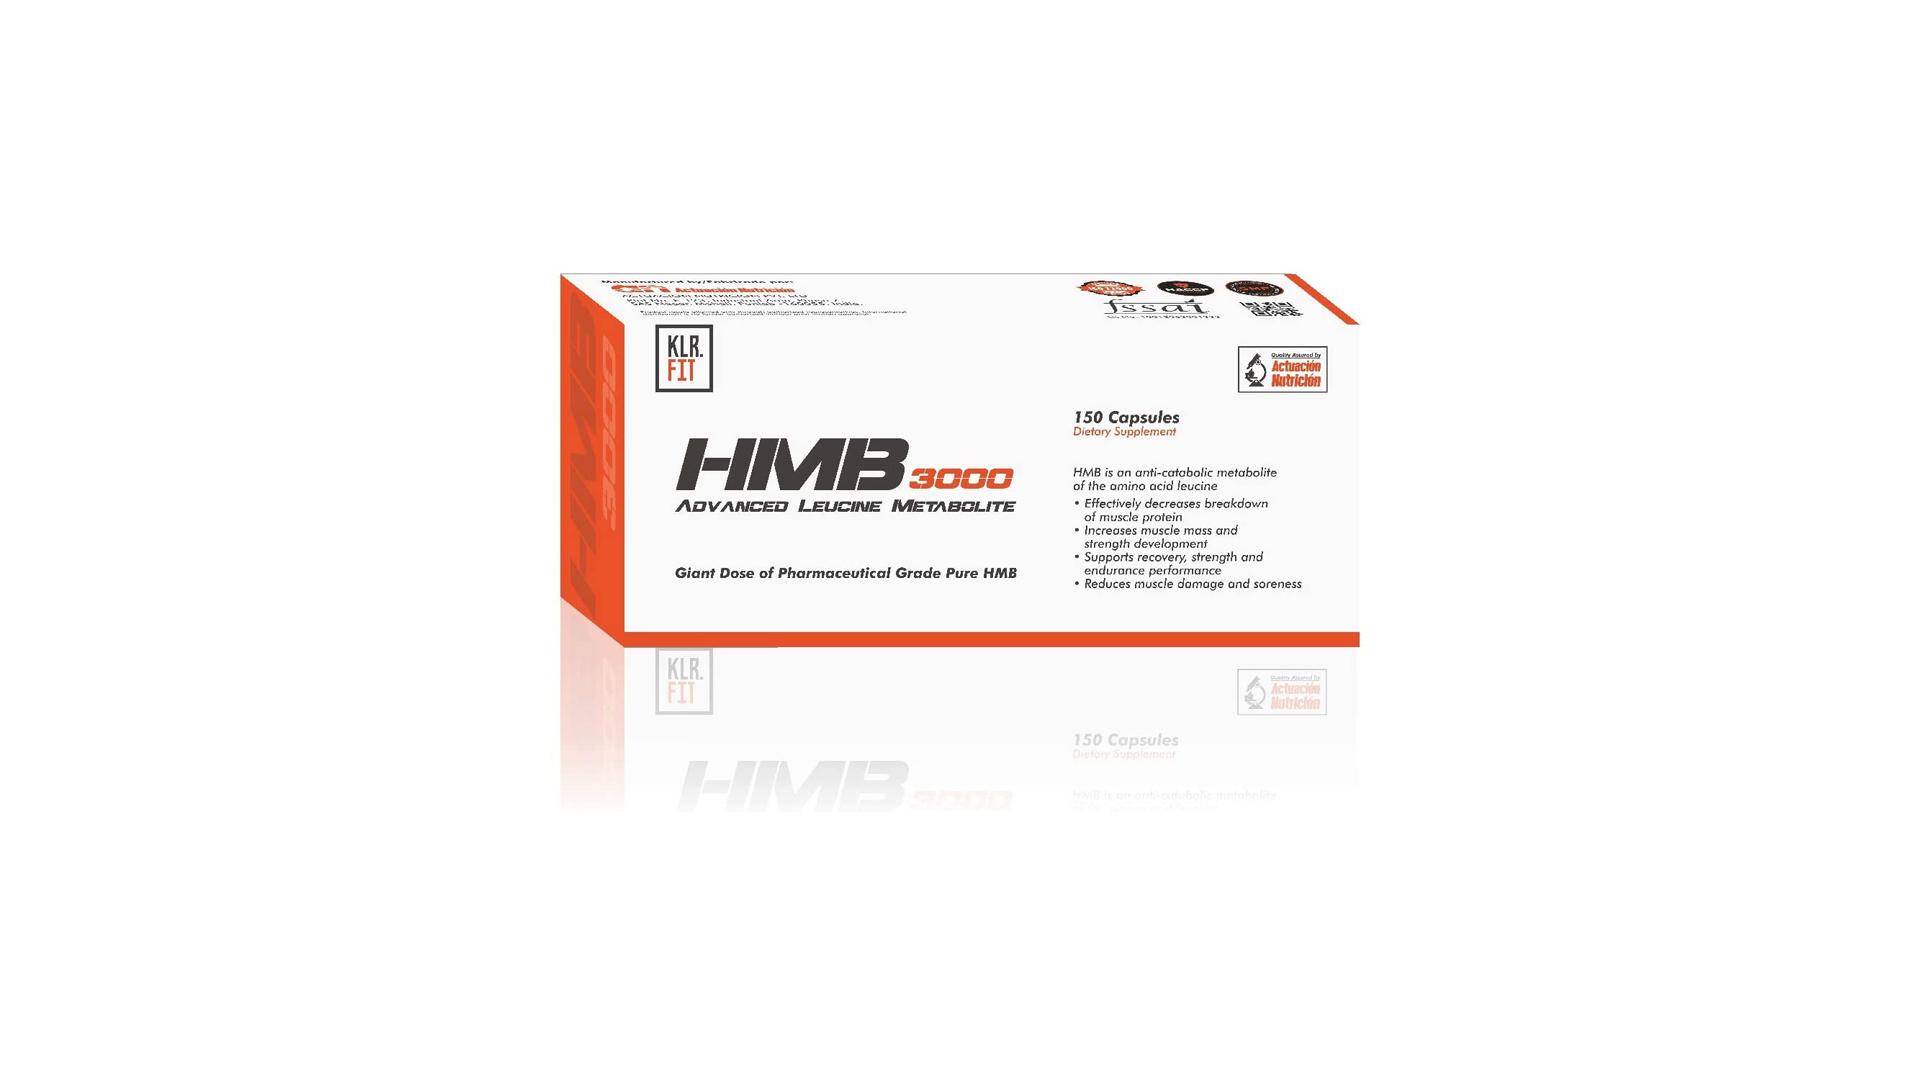 Klr.Fit's HMB 3000 Advanced Leucine Metabolite.